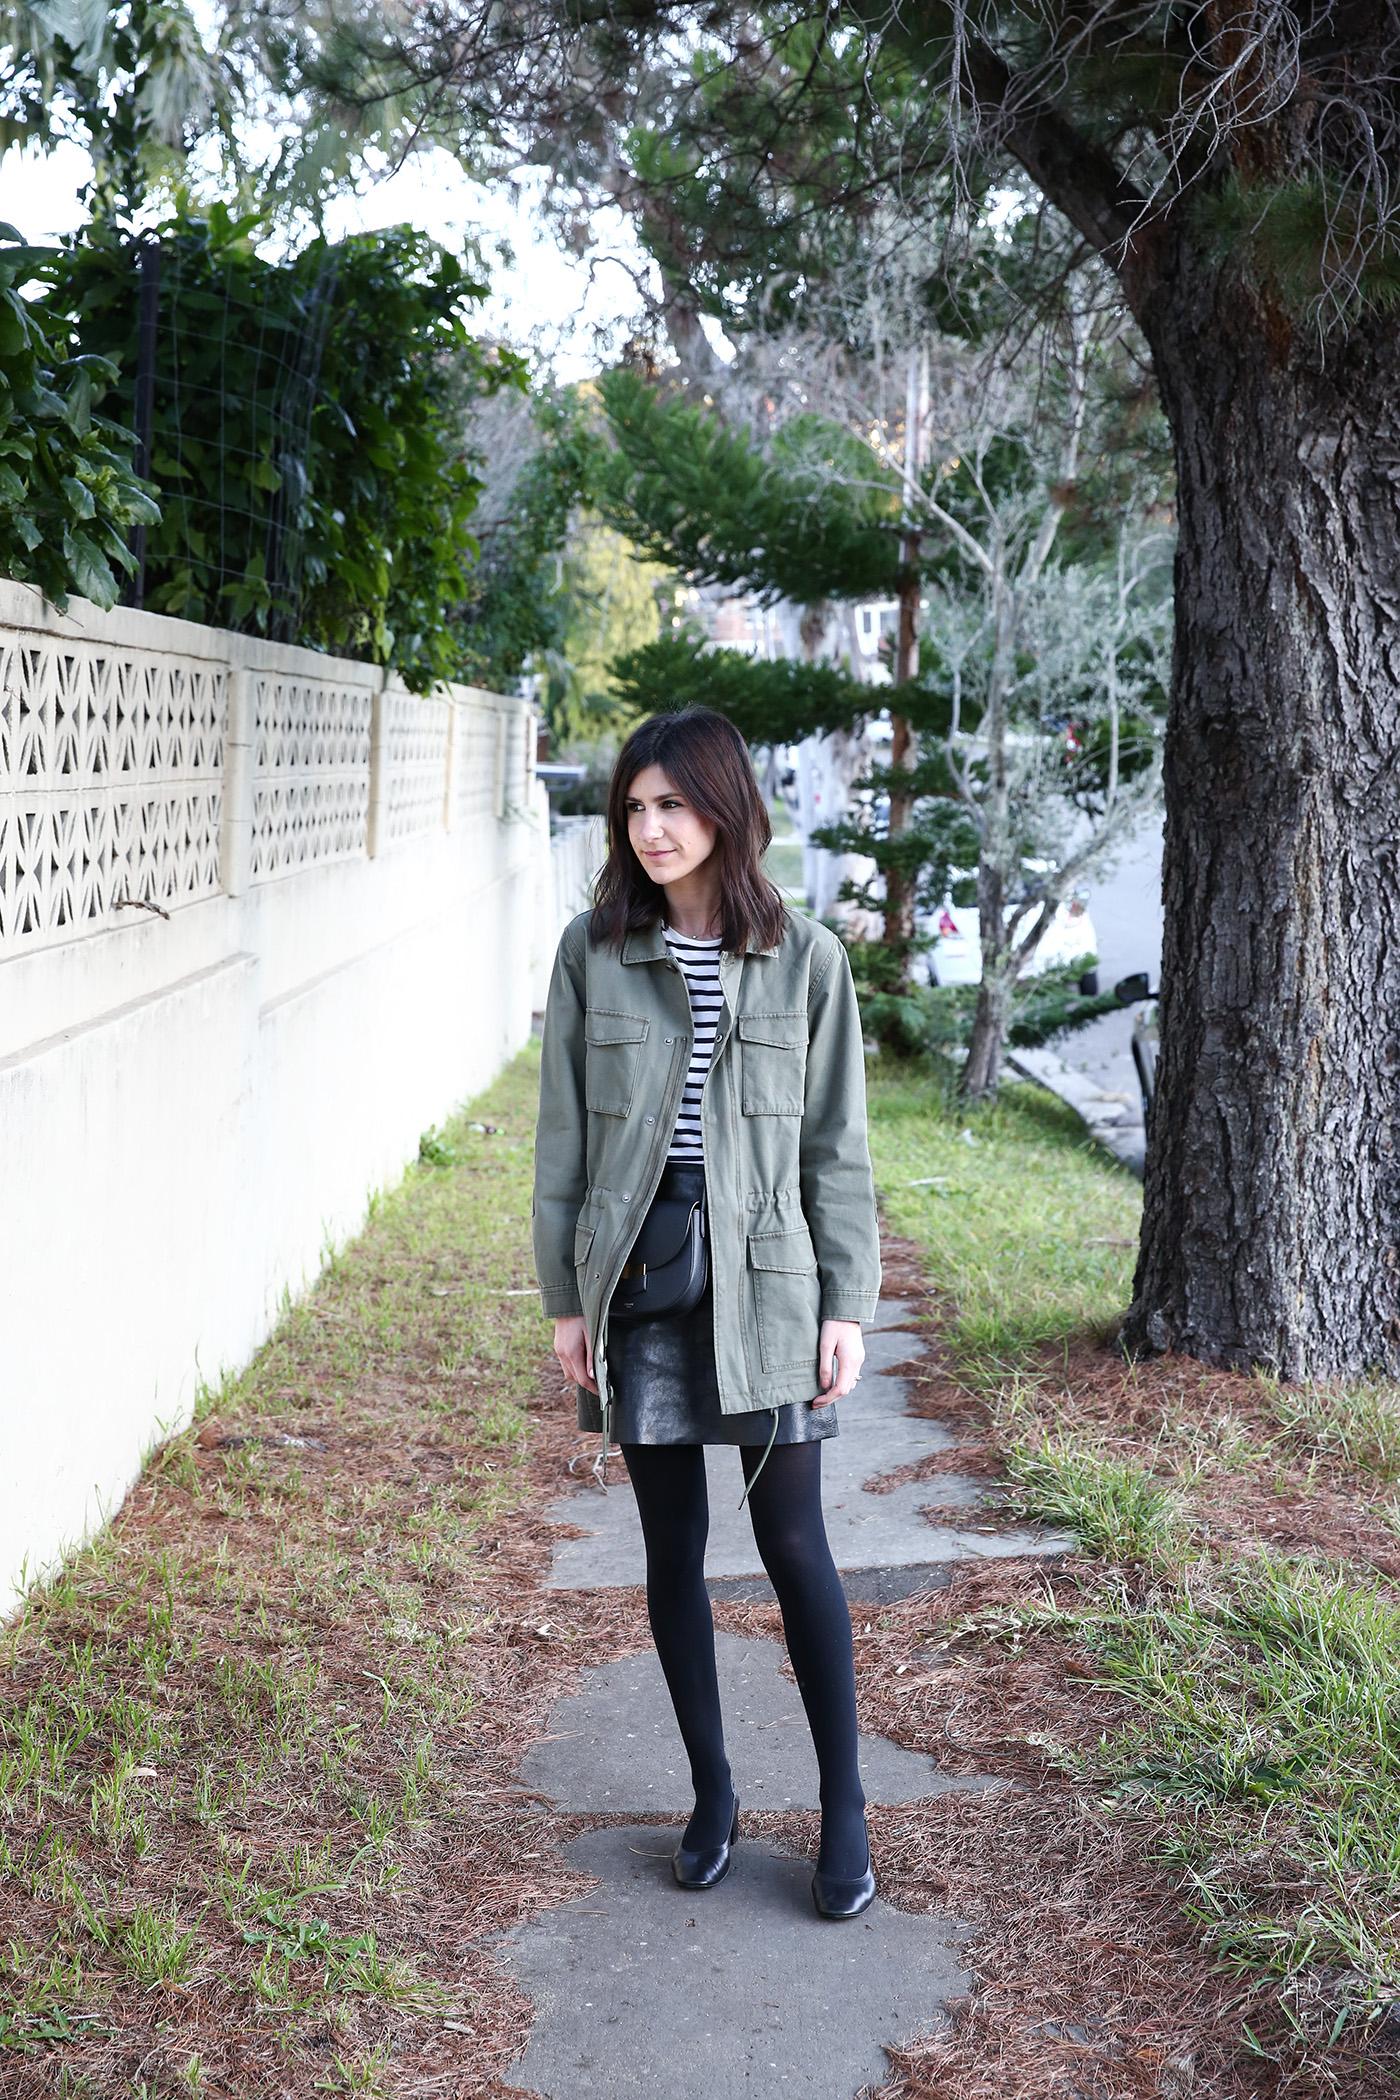 mademoiselle outfit wearing breton stripe top army jacket